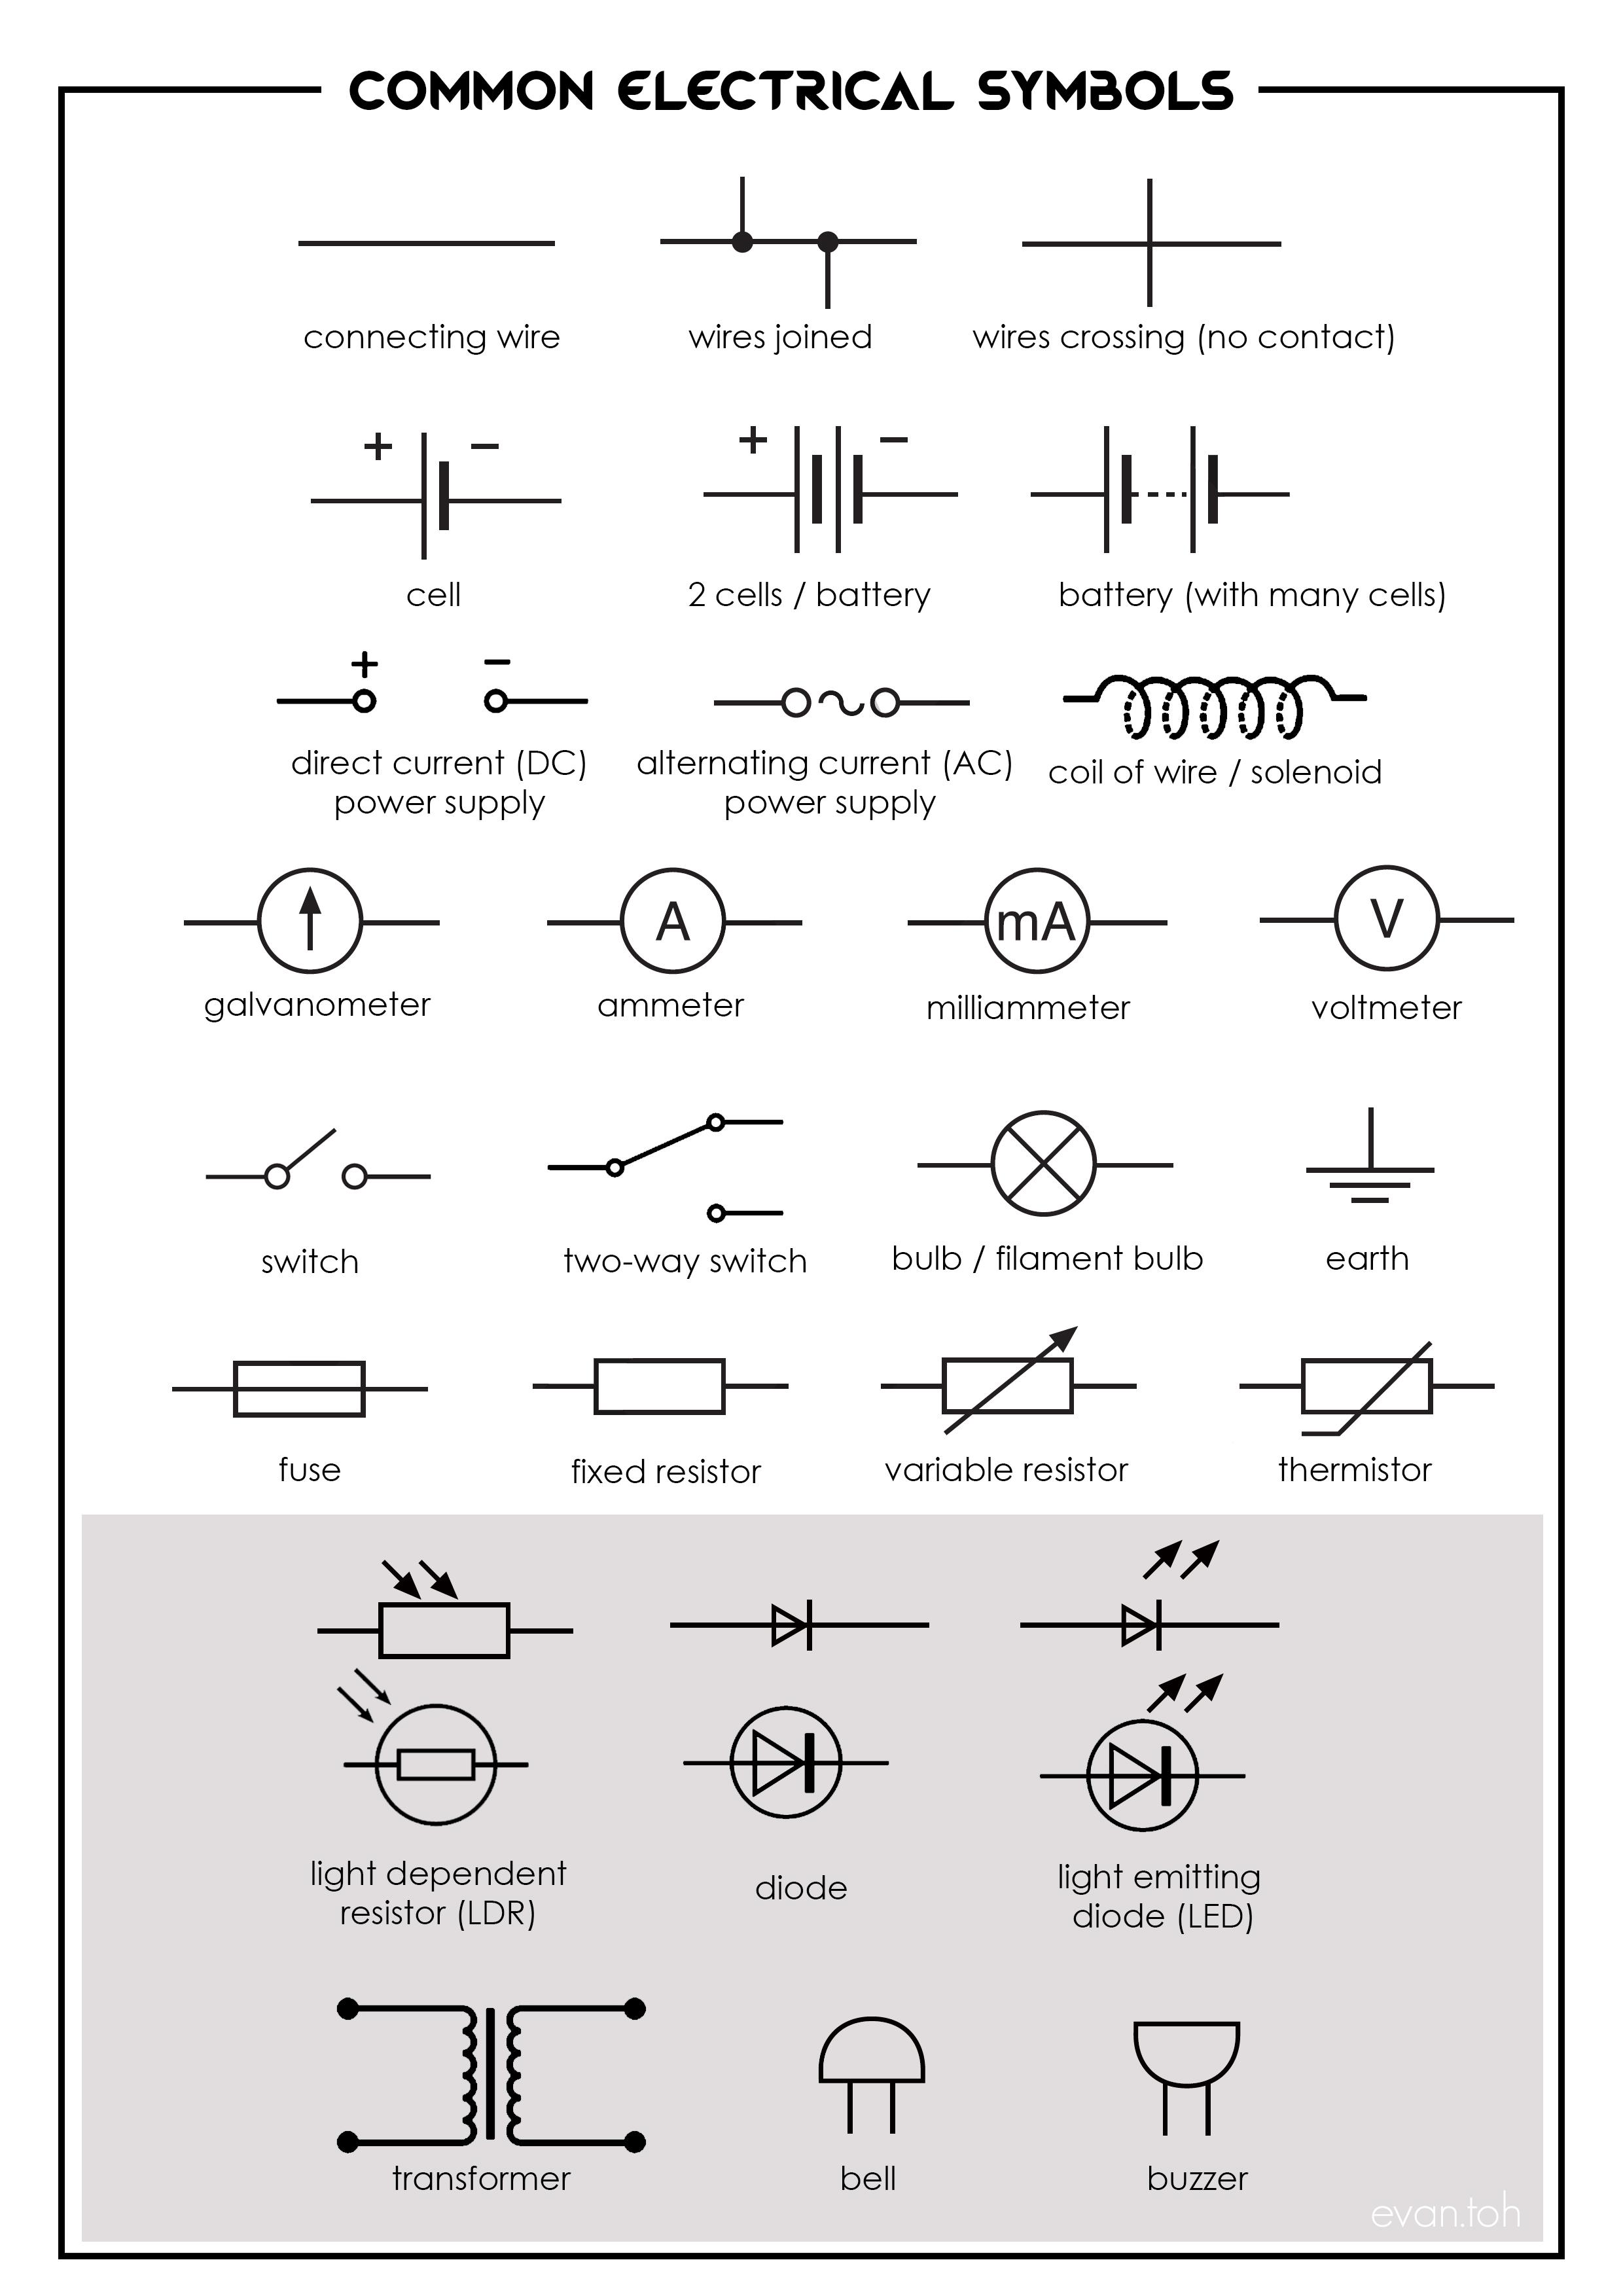 common electrical symbols evan u0027s spacedc wiring symbols 4 [ 2480 x 3508 Pixel ]